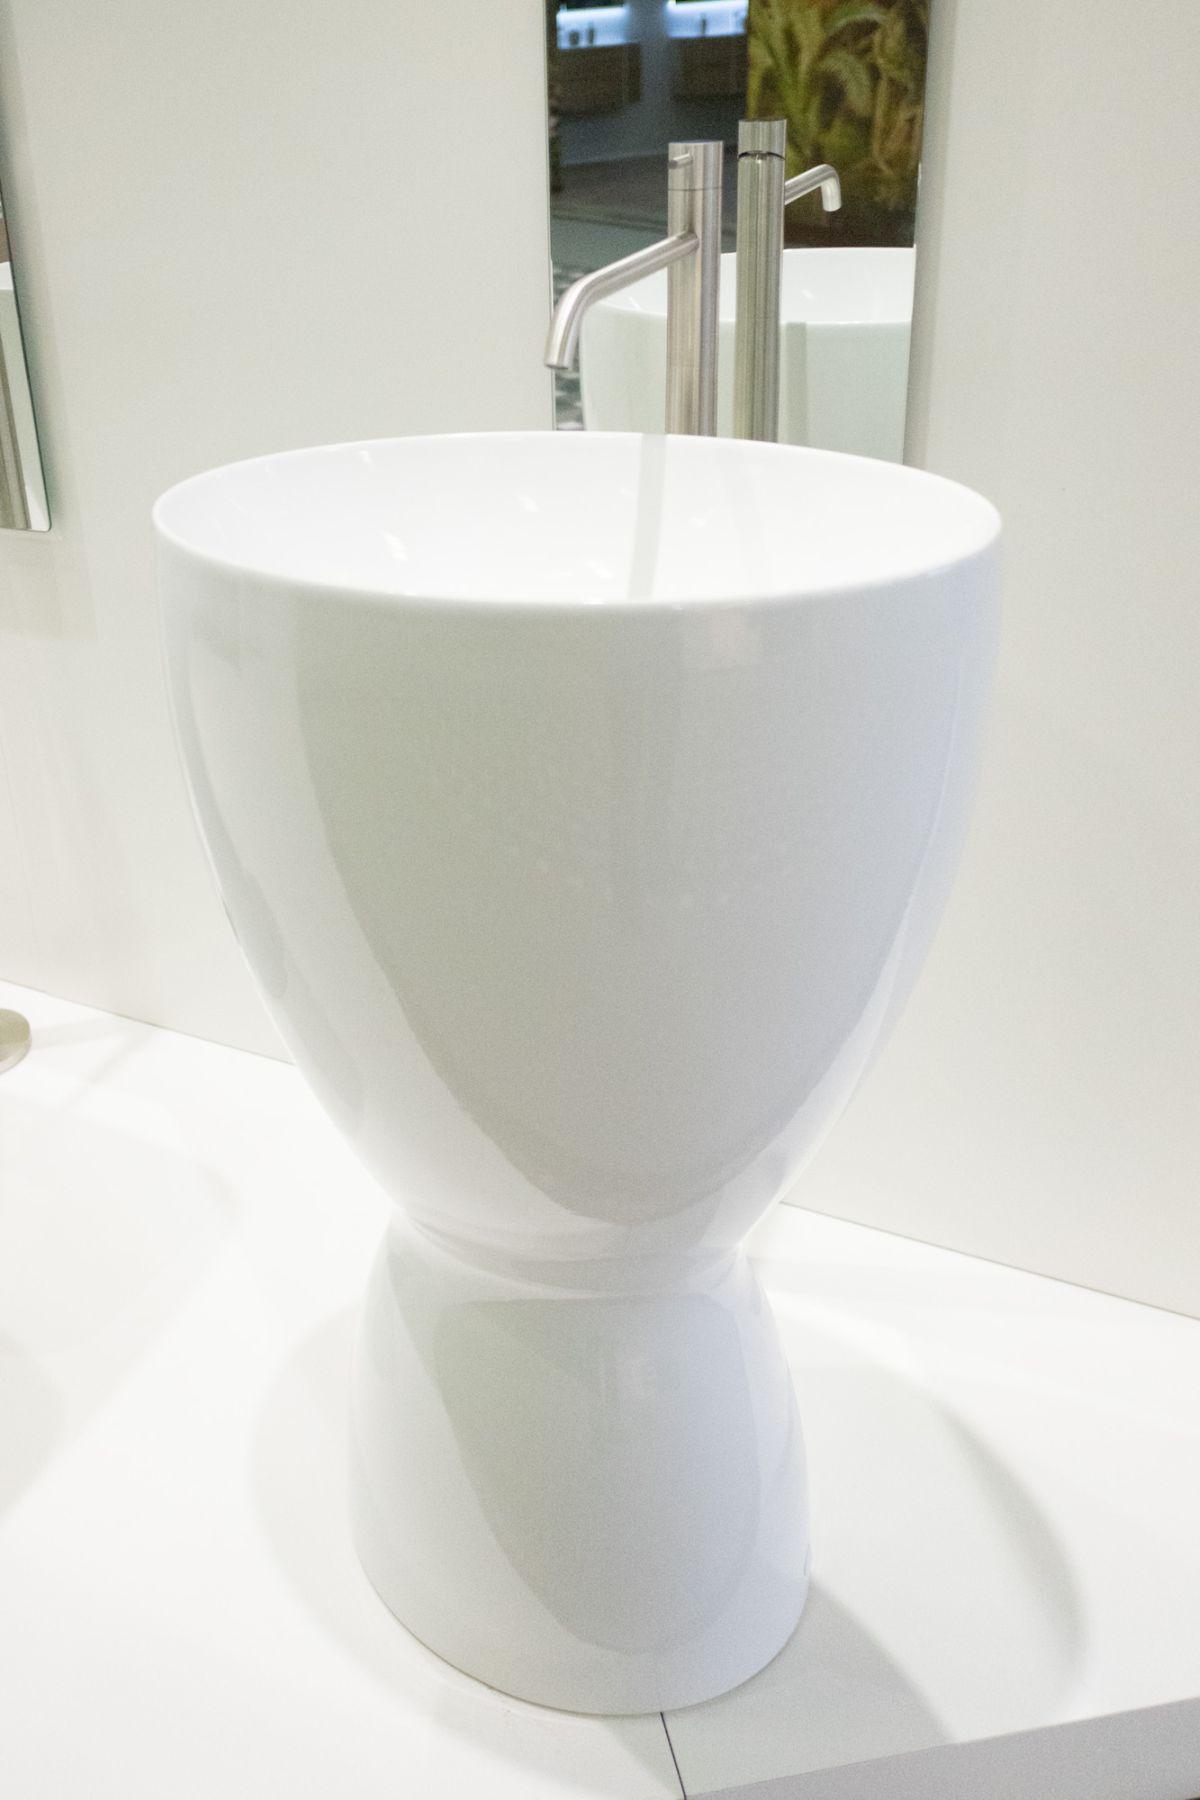 Modern white ceramic Eto pedestal sink